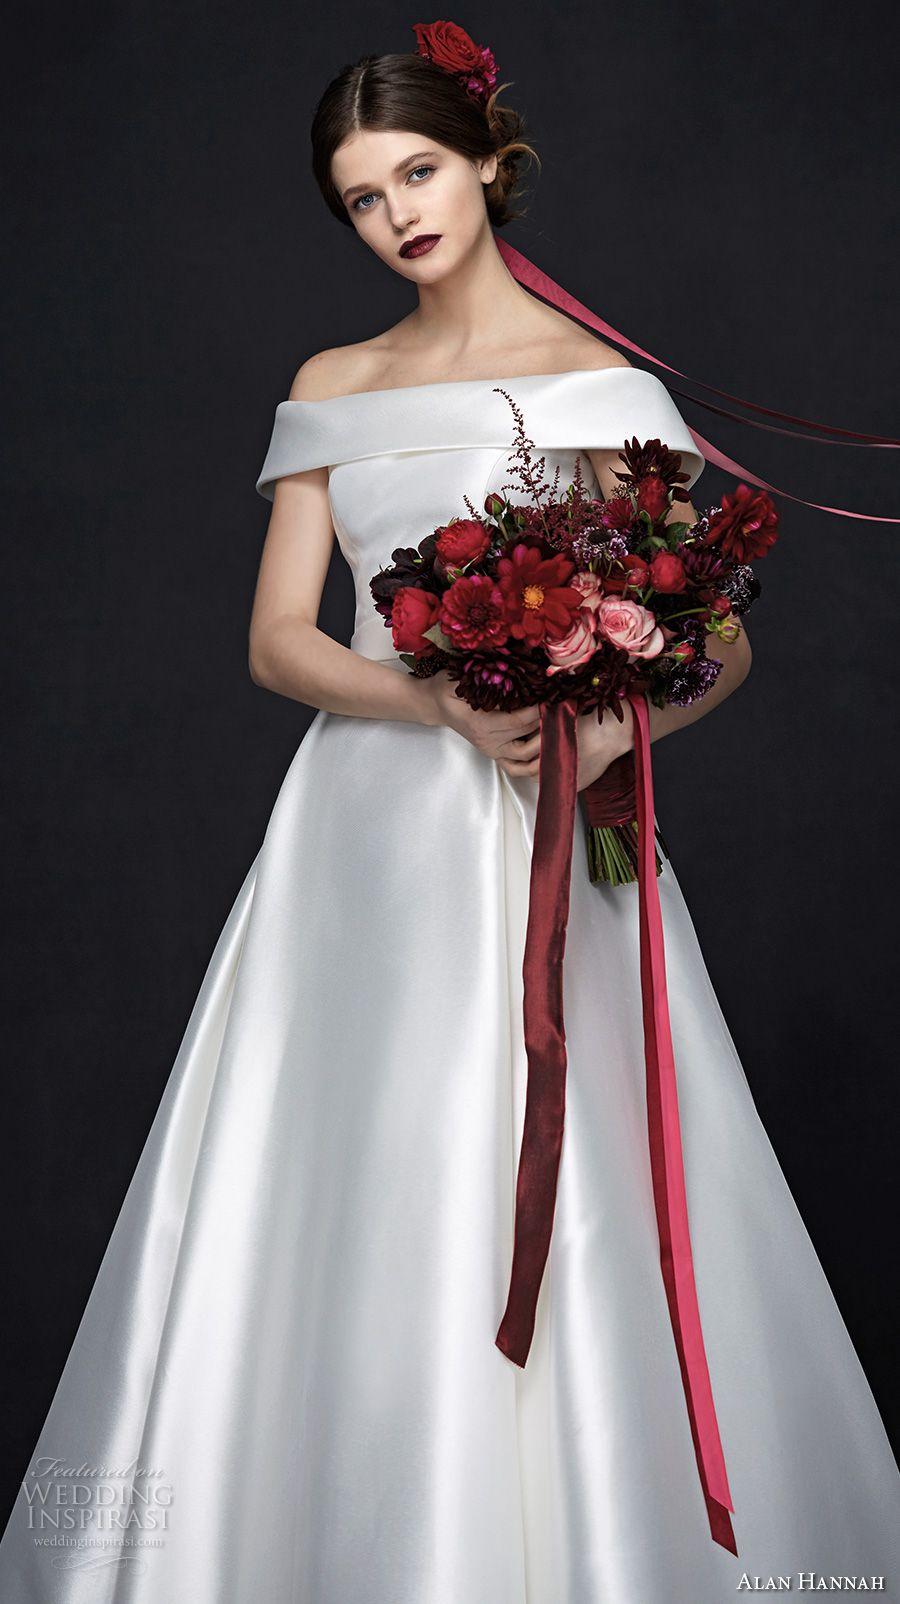 Alan Hannah 2017 Bridal Off The Shoulder Straight Across Neckline Simple Clean Satin Elegant Clic A Line Wedding Dress Millie Mv